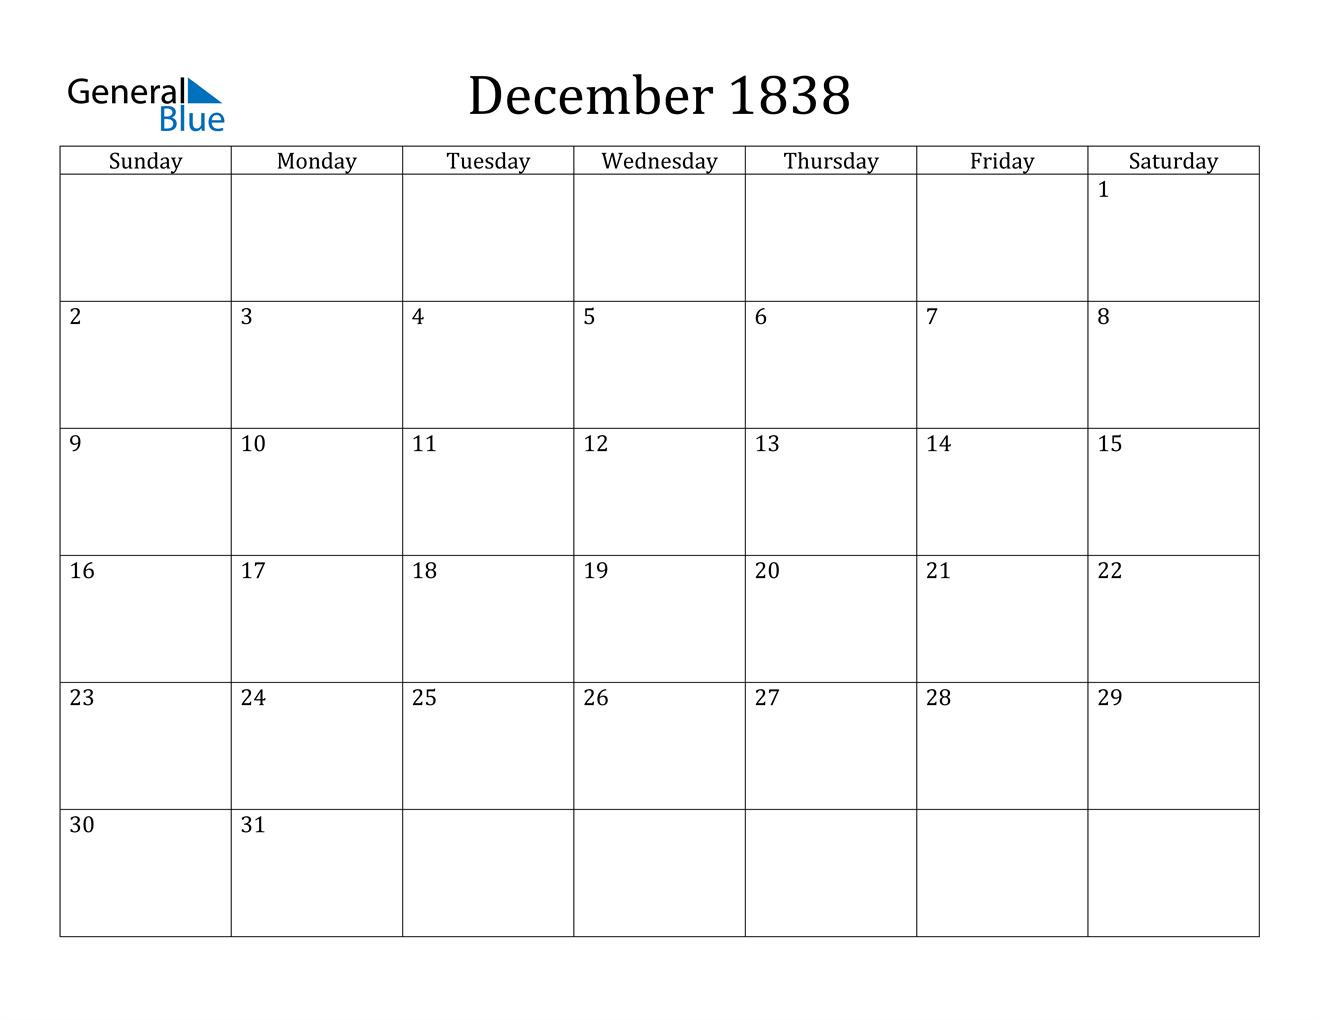 Image of December 1838 Calendar